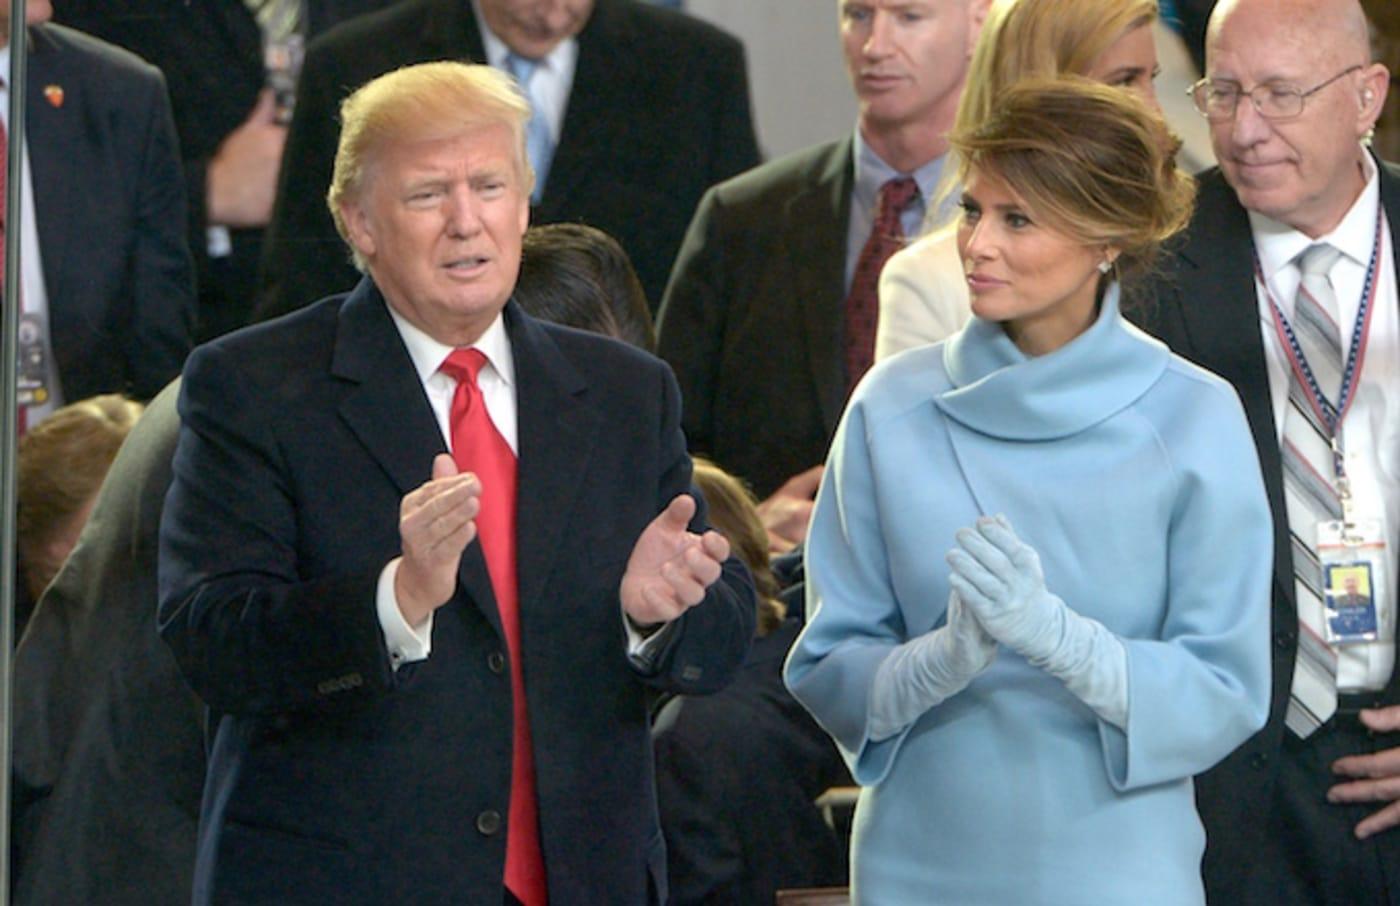 Donald Trump during his inauguration.